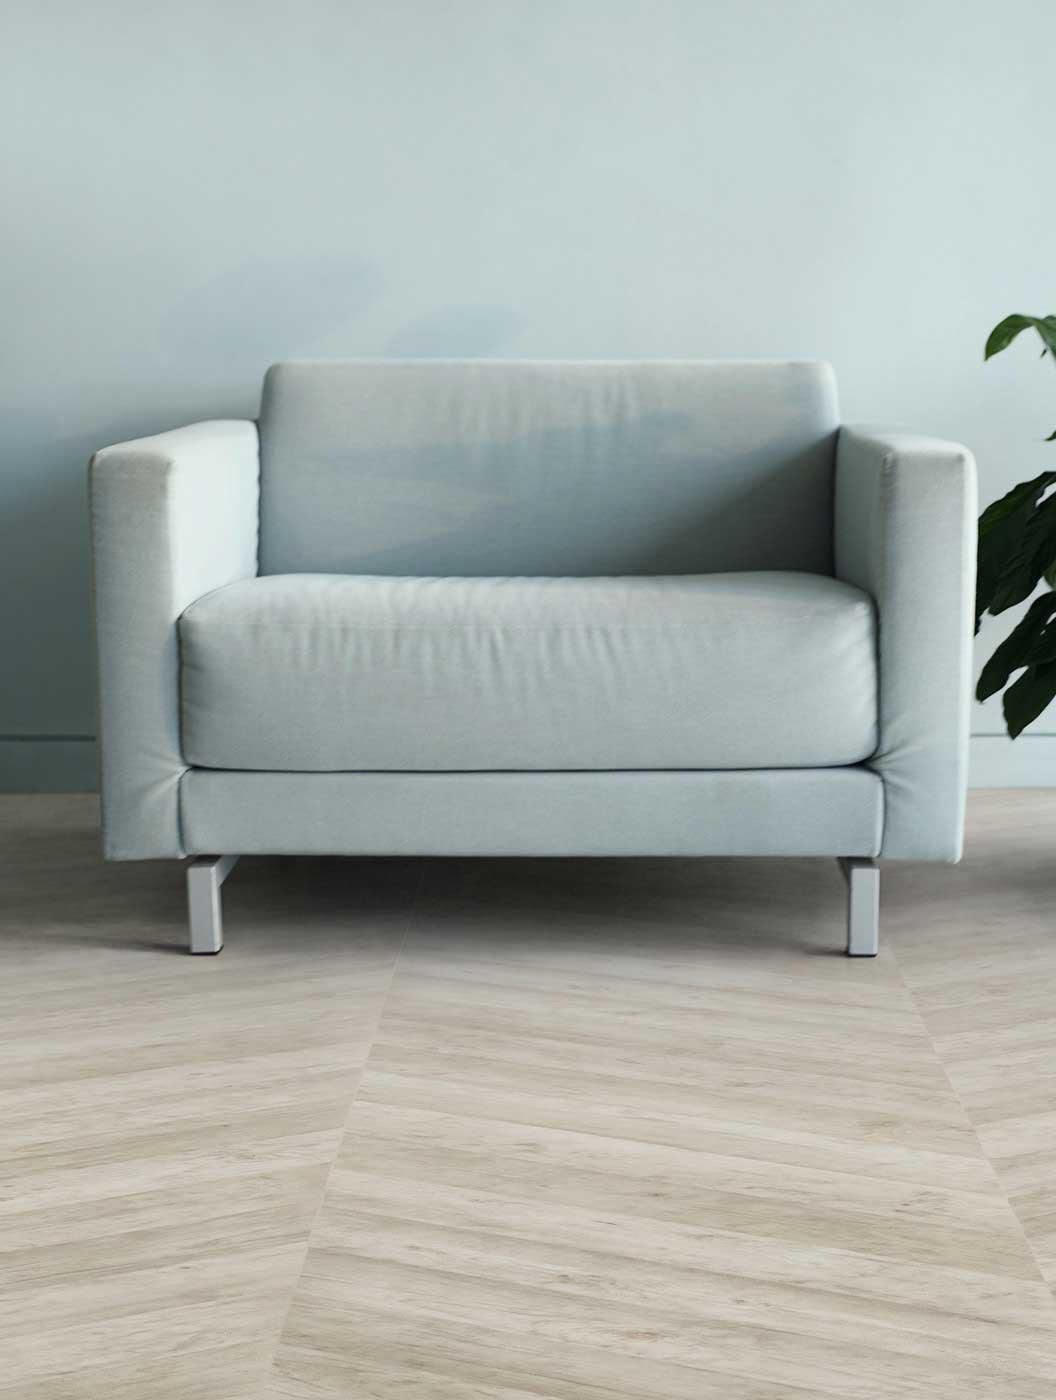 pvc bodenbelag aus hart pvc 2m breit online kaufen. Black Bedroom Furniture Sets. Home Design Ideas